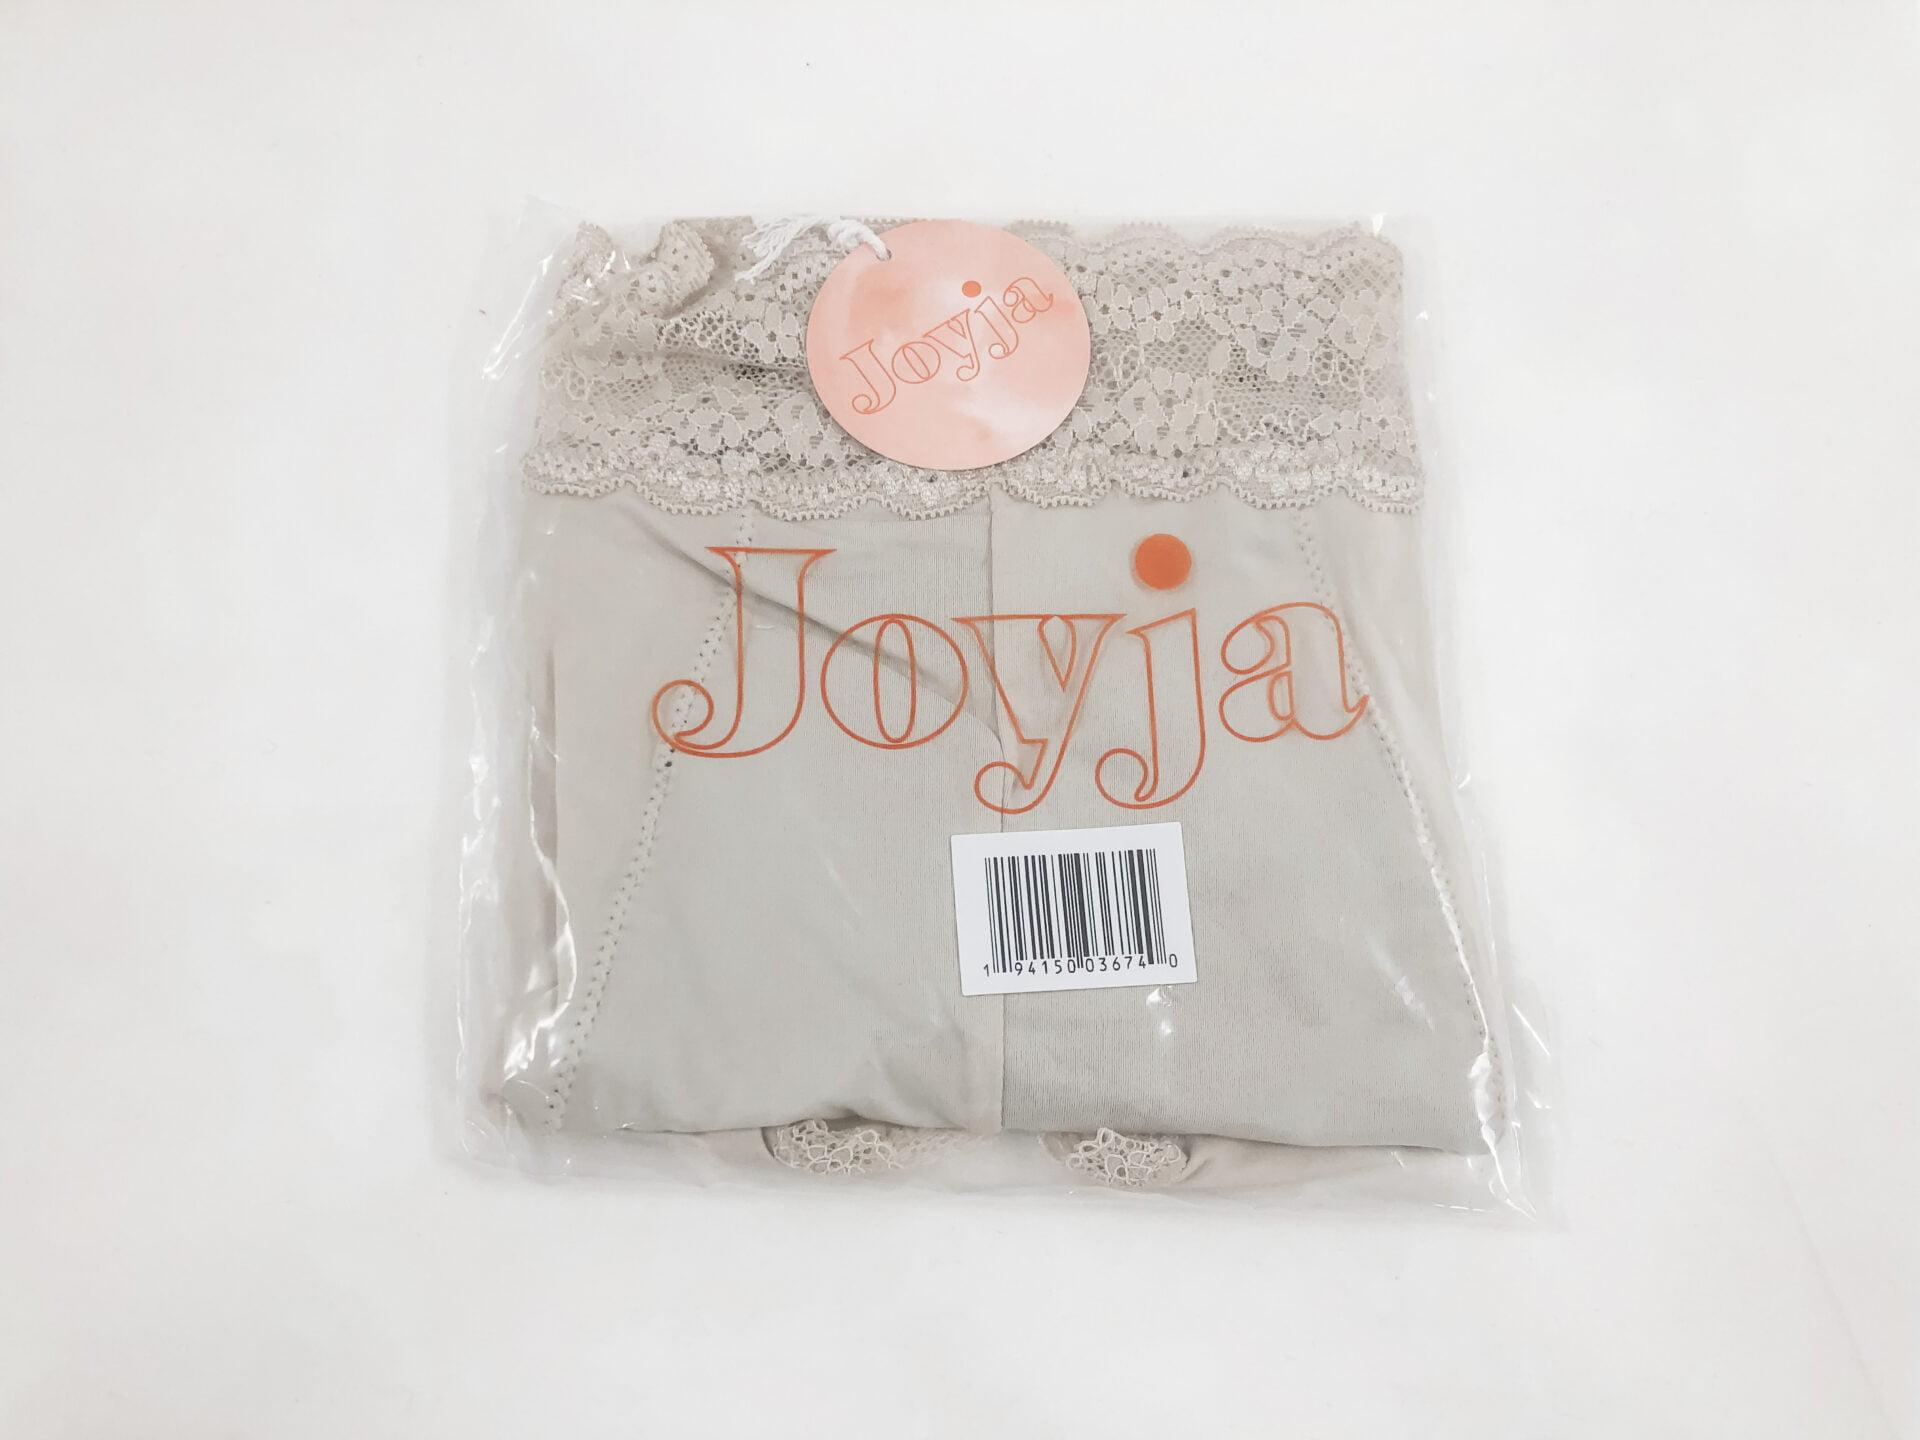 "Joyja Period Underwear PFAS ""Forever Chemicals"" Lab Results"